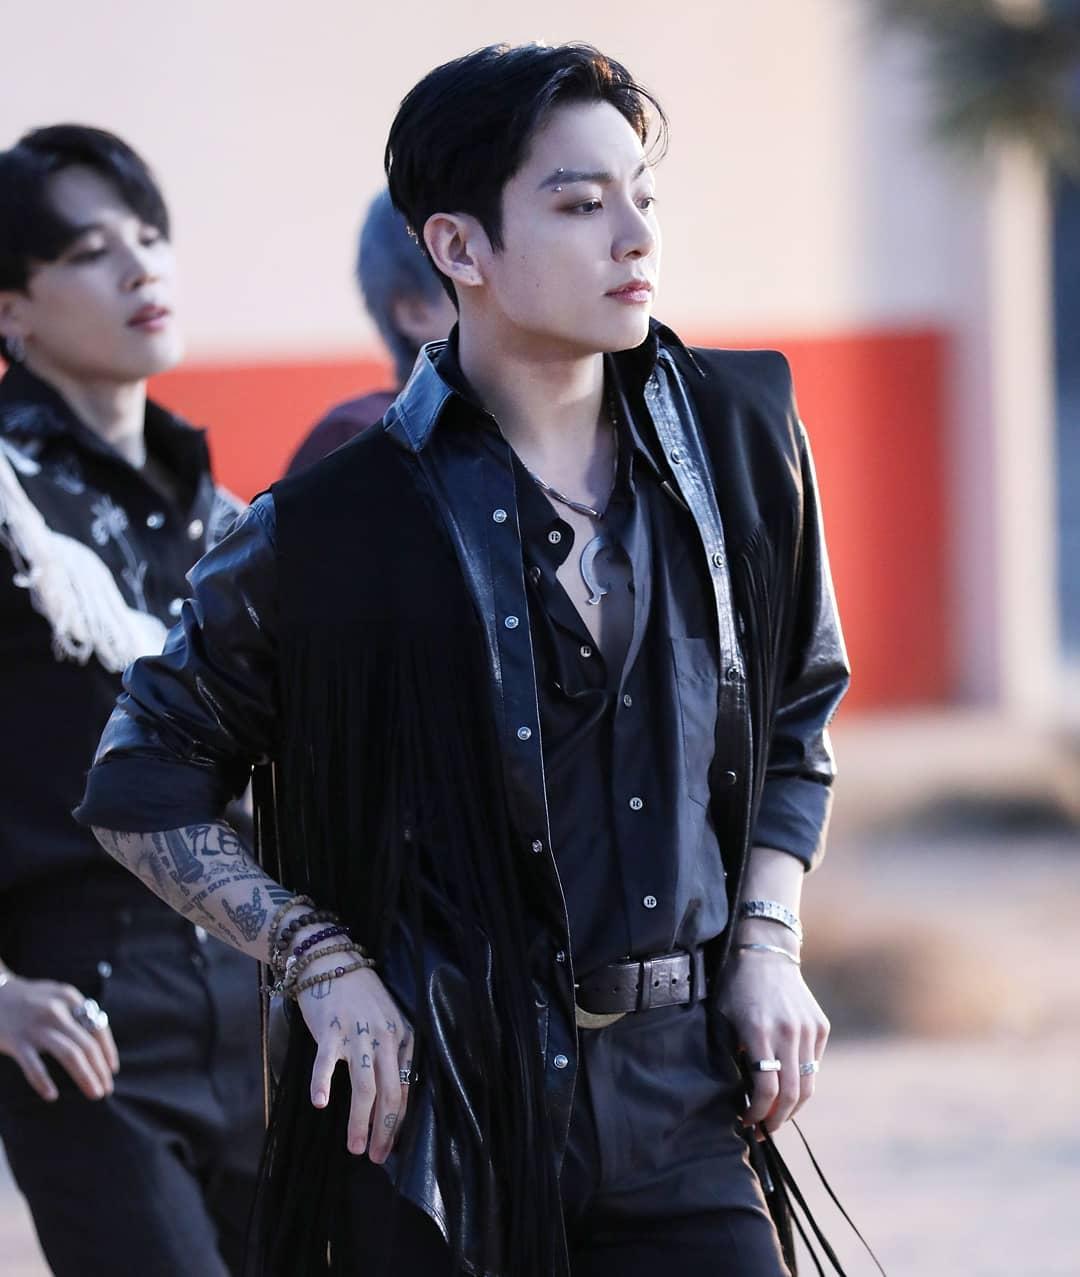 BTS Jungkook's VLIVE concert that drew an explosive response